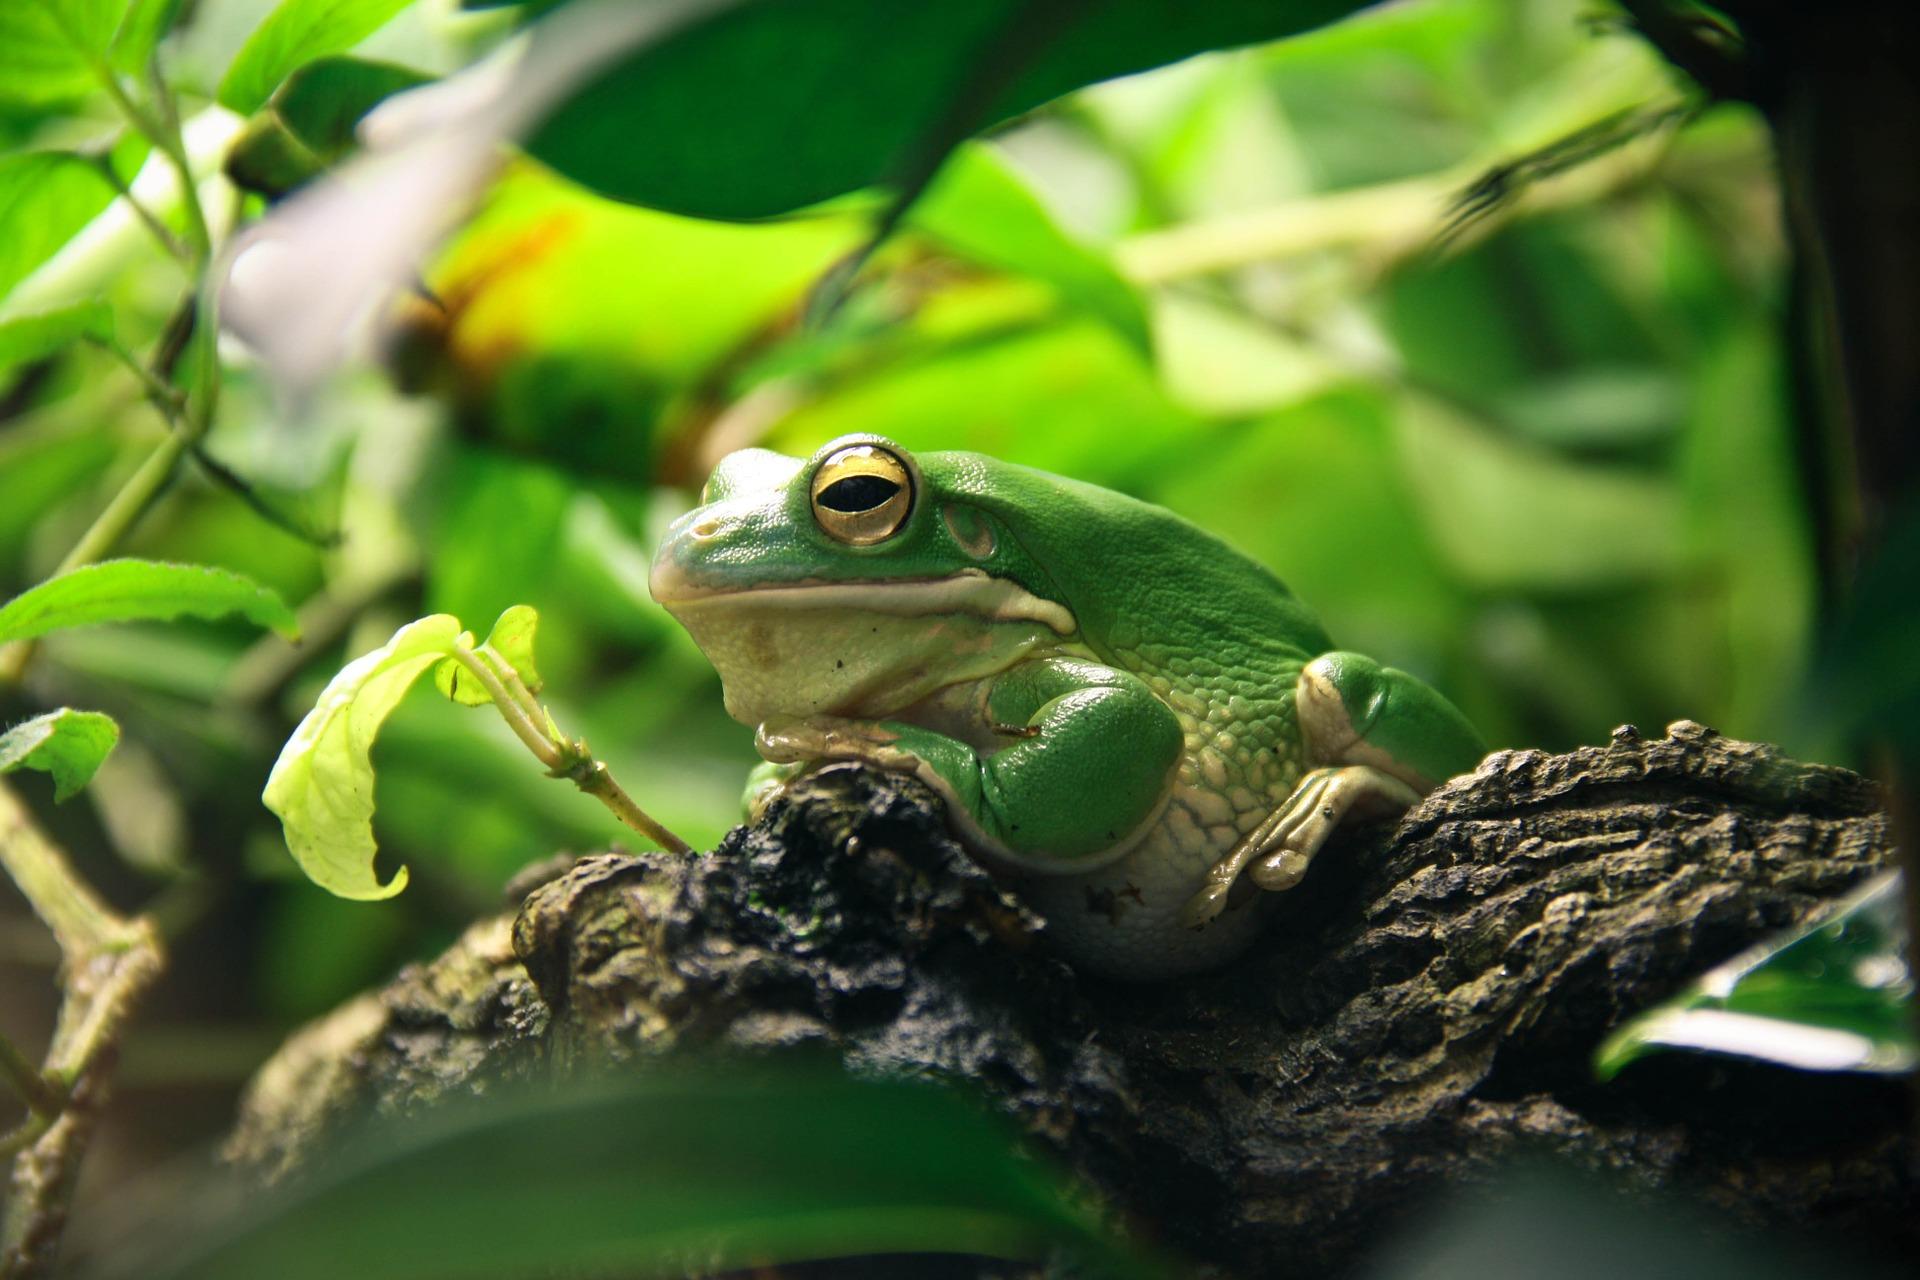 frog-663966_1920.jpg